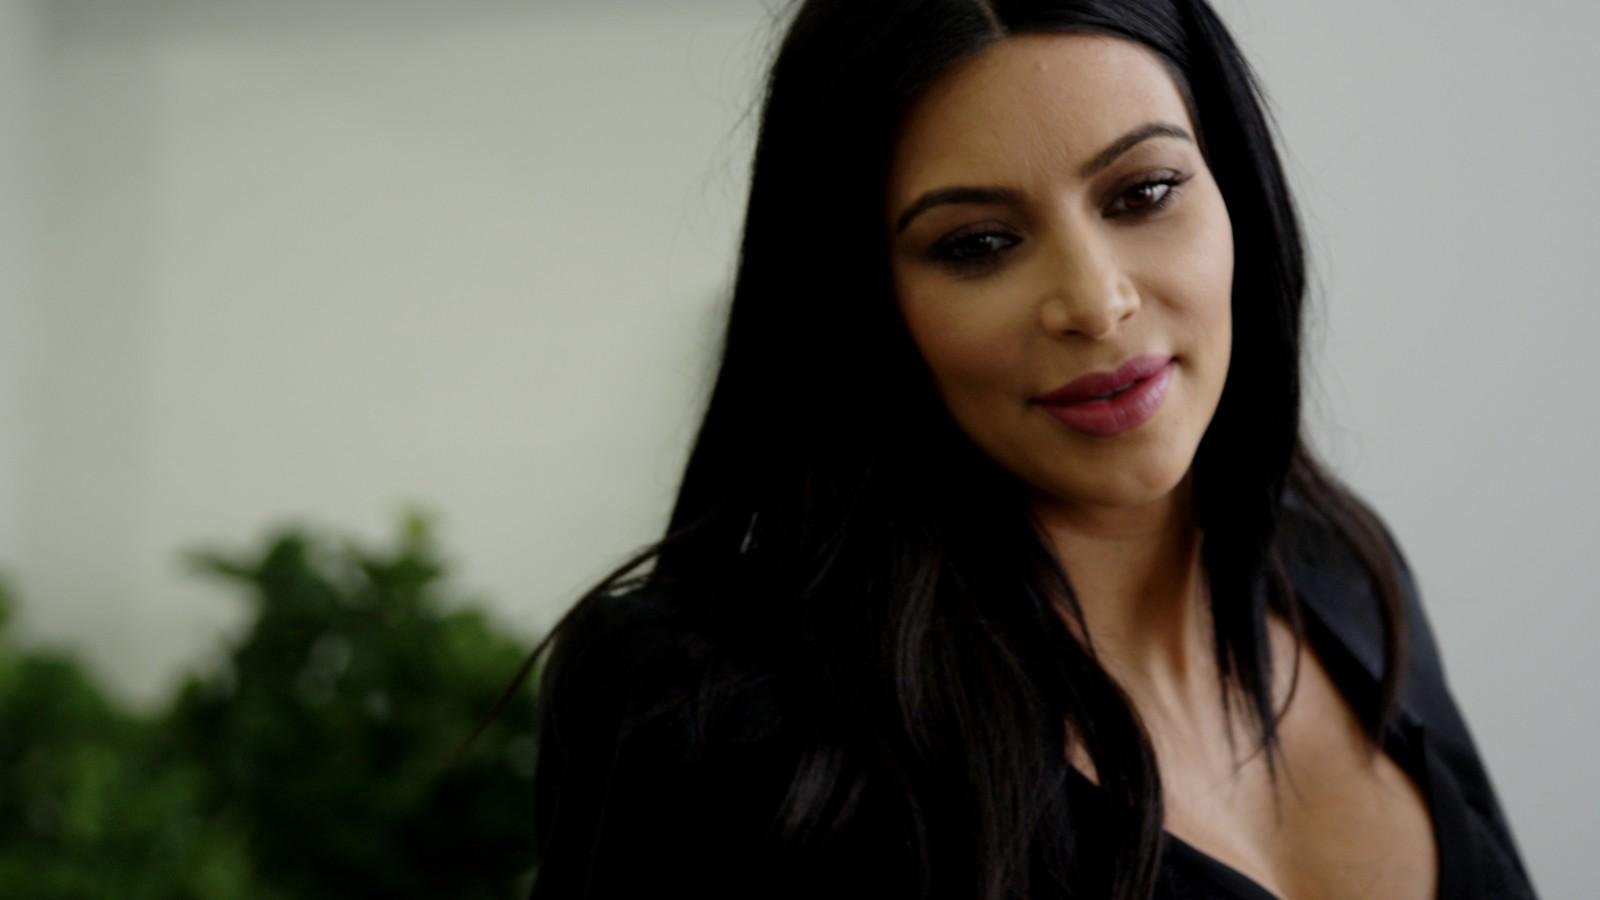 Exclusive: Getting dressed with Kim Kardashian